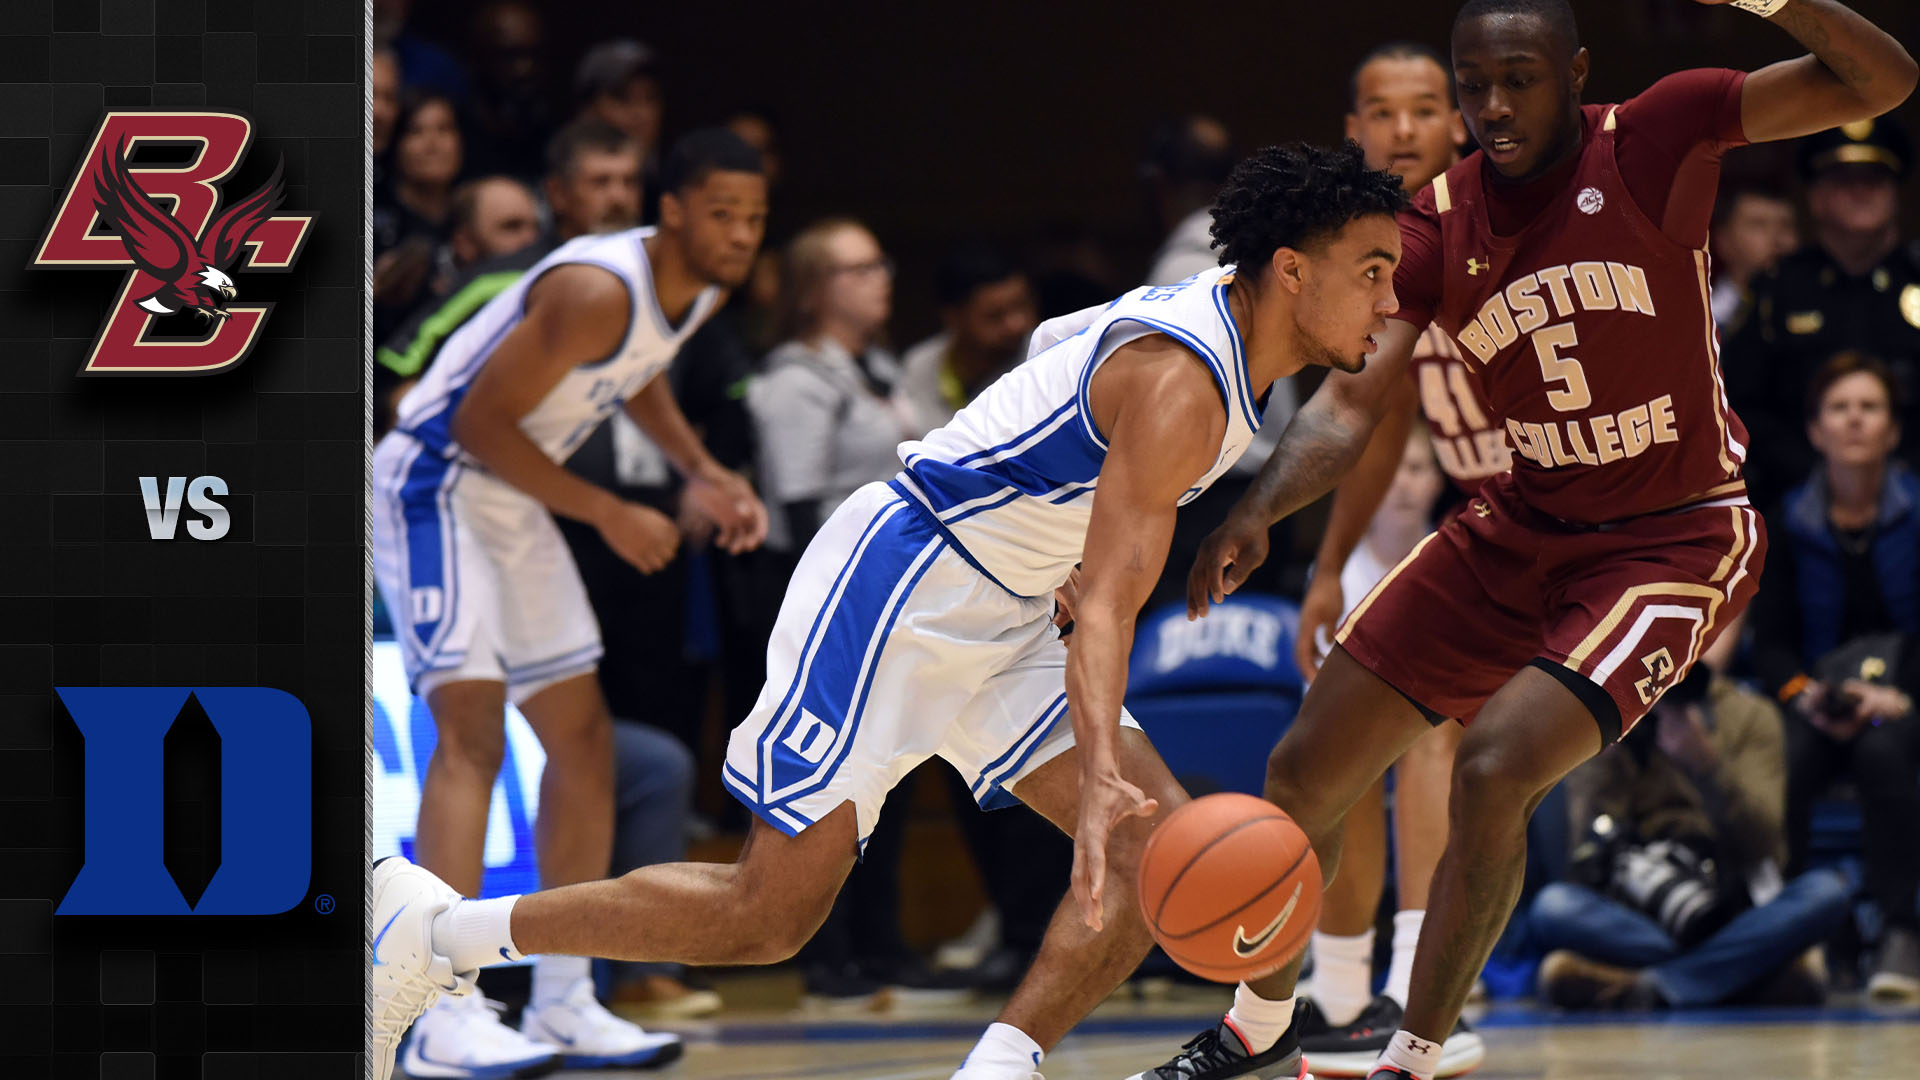 Duke Crushes Boston College by 39 ( 88-49  ) Matthew Hurt scores 25; Jones with 10 assists